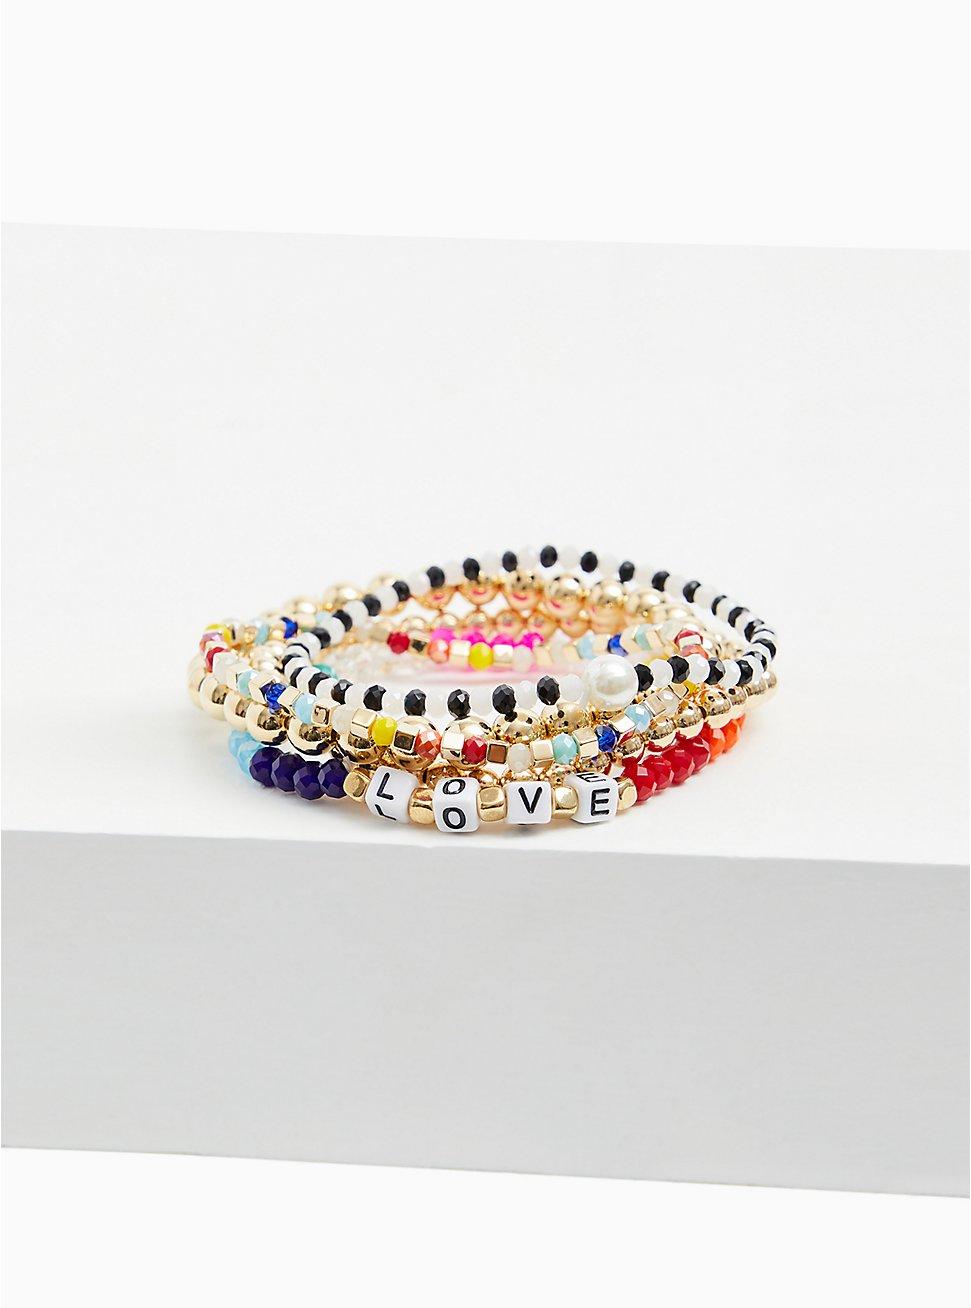 Love Multi Bead Stretch Bracelet Set - Set of 5, MULTI, hi-res